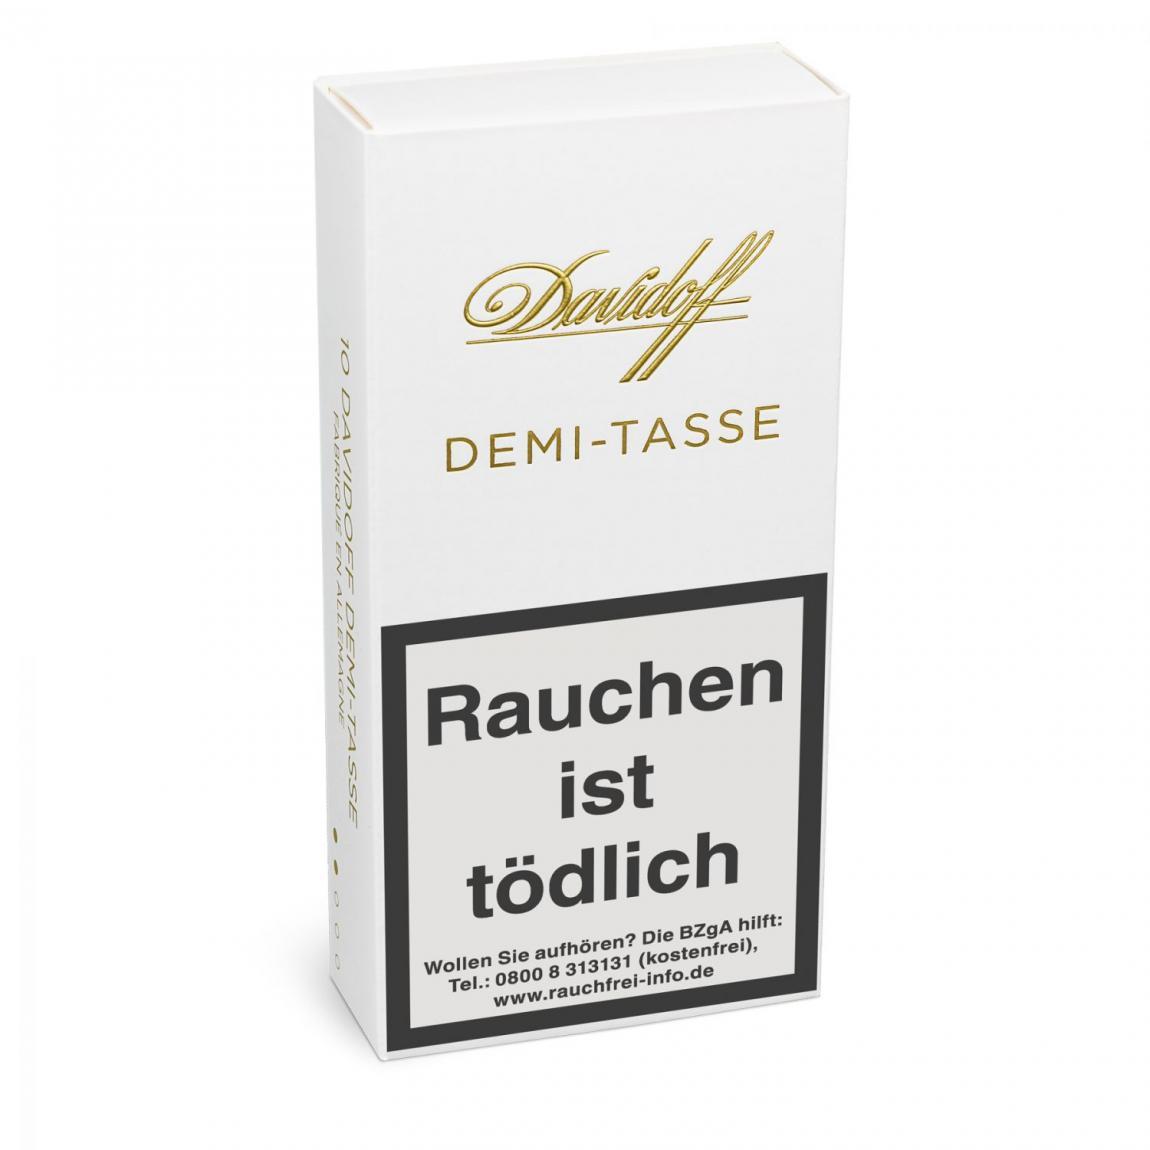 DAVIDOFF Demi-Tasse 10er Schachtel